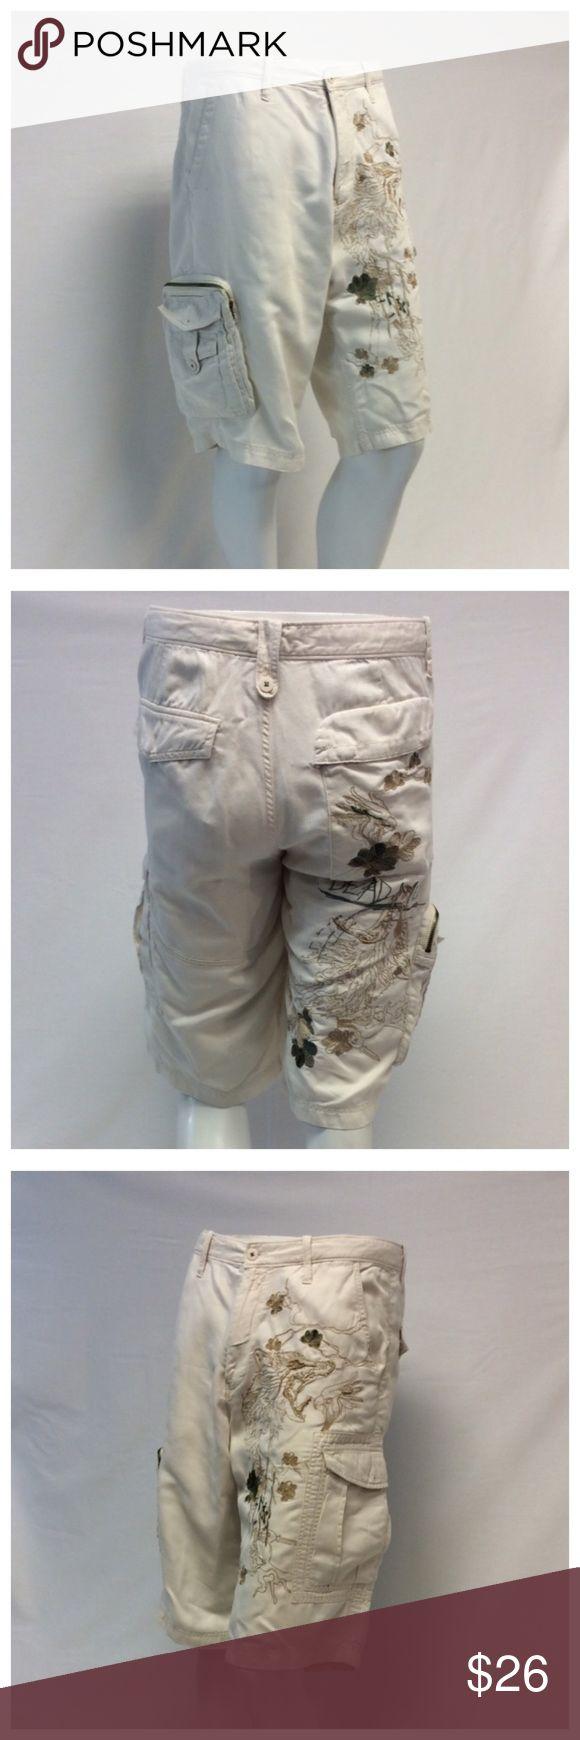 "ARTFUL DODGER Men's Shorts ARTFUL DODGER Men's Shorts, Size 34, 55% linen, 45% cotton, machine washable. Design embroidered on 1 front and 1 back leg, 2 leg pockets, 2 back pockets, 1 zippered pocket. Approximate measurements are 17"" waist laying flat, 24"" waist to hem, 12"" waist to crotch, 14"" inseam, 6"" zipper. 0584 Artful Dodger Shorts"